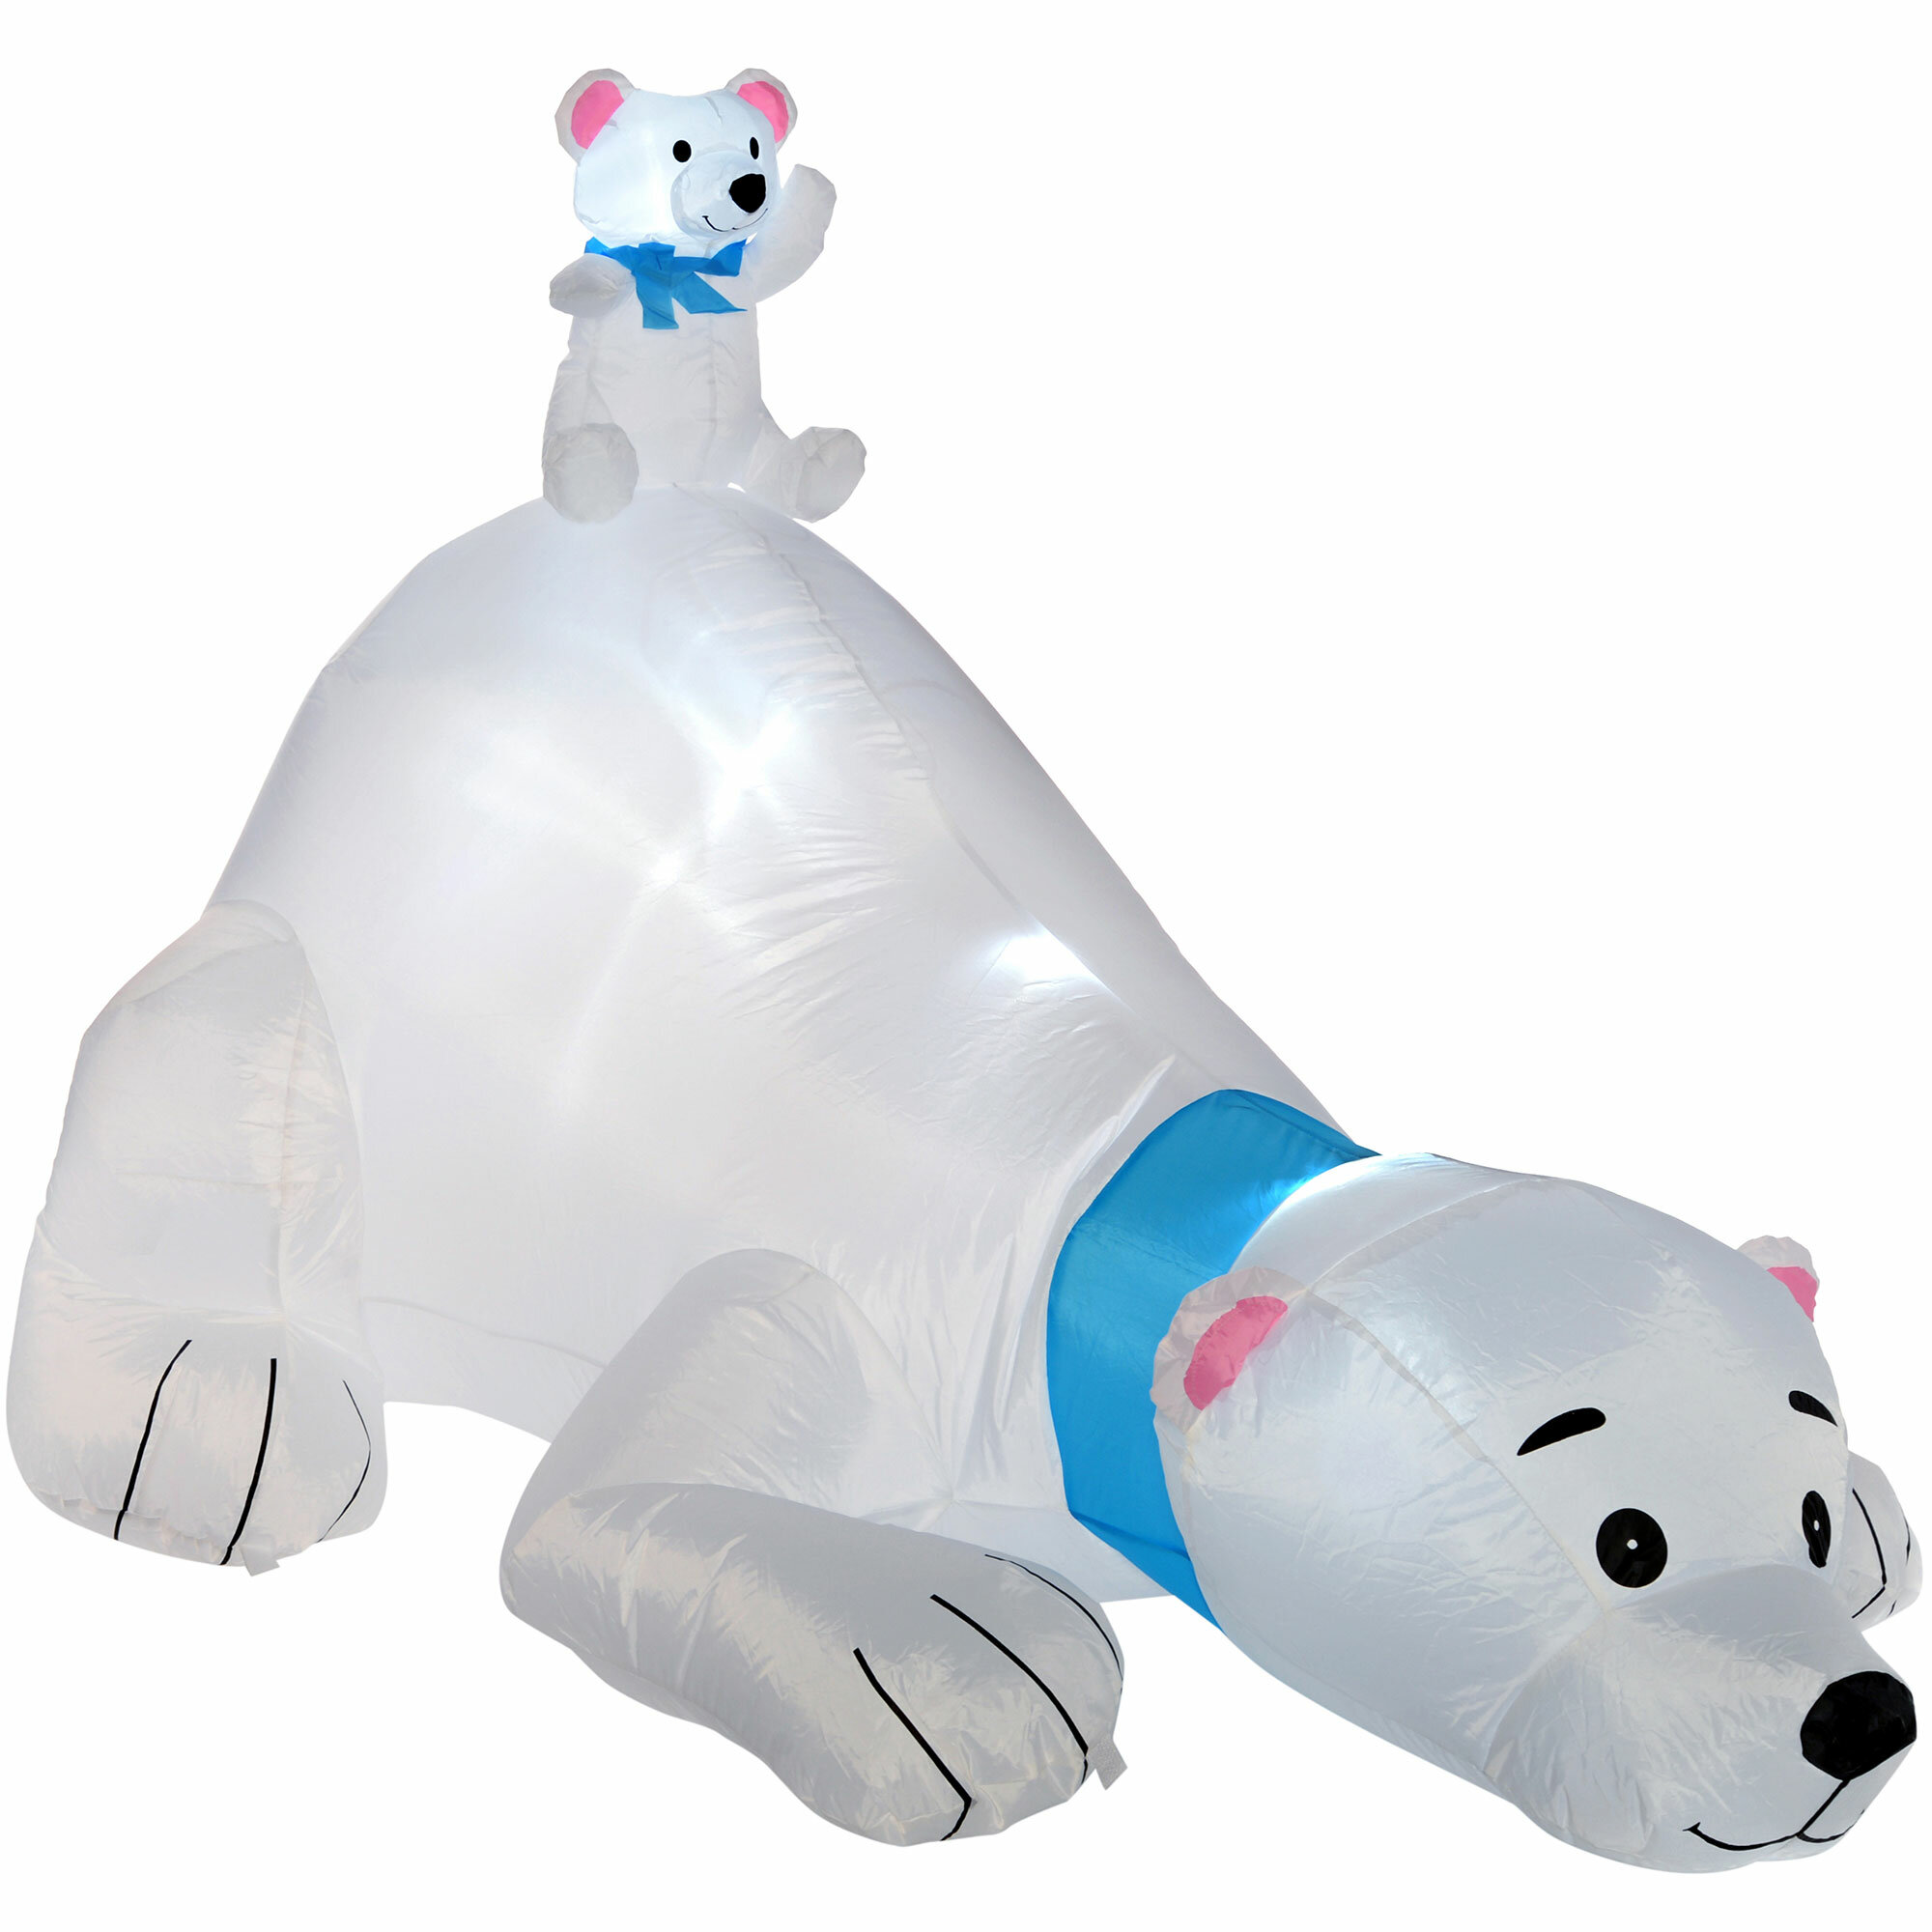 the seasonal aisle 180cm pre lit polar bear inflatable christmas decoration with led light and fan wayfaircouk - Polar Bear Inflatable Christmas Decorations